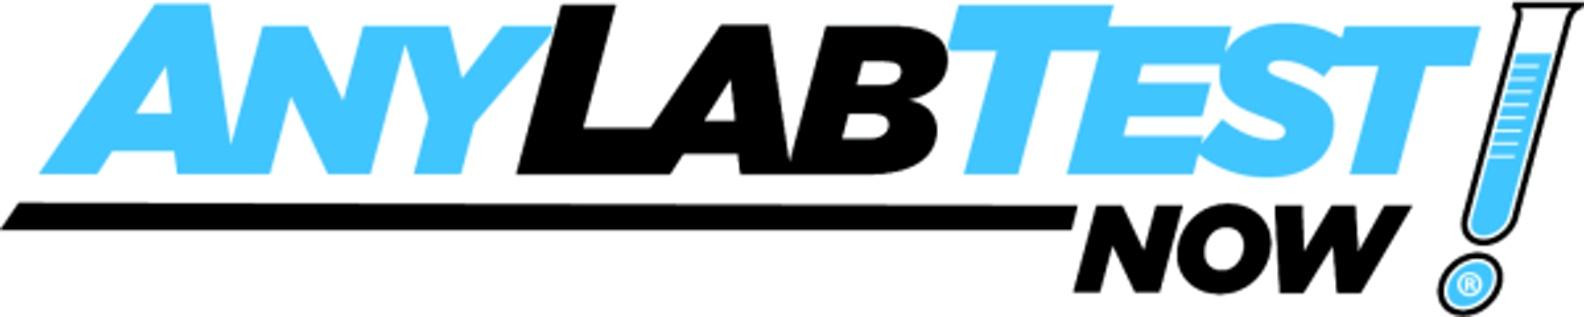 Any Lab Test Now - Buckhead Logo